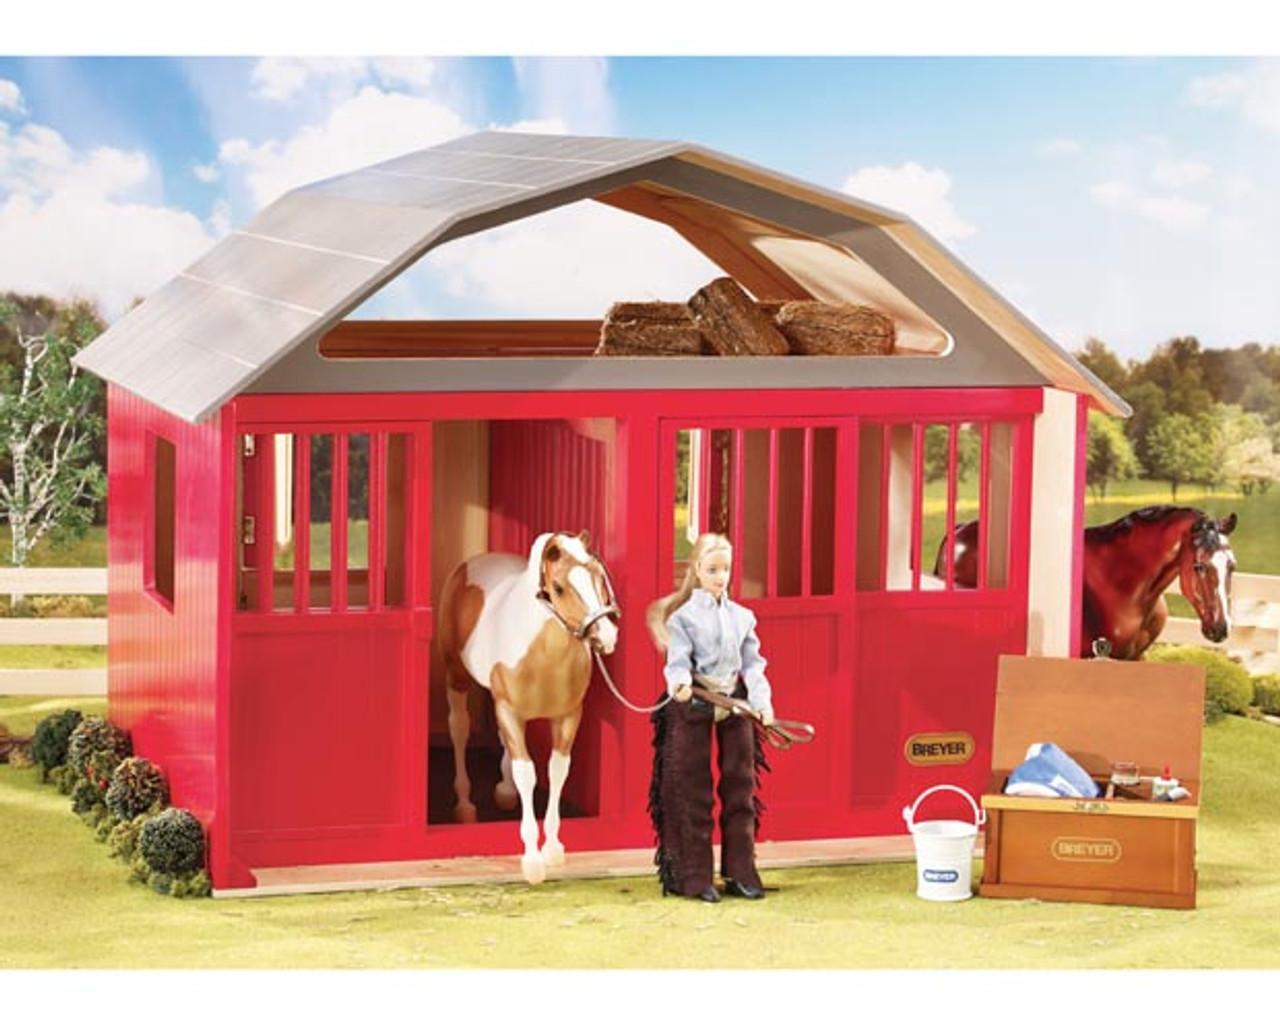 hacking keva breyer horses horse img planks barns